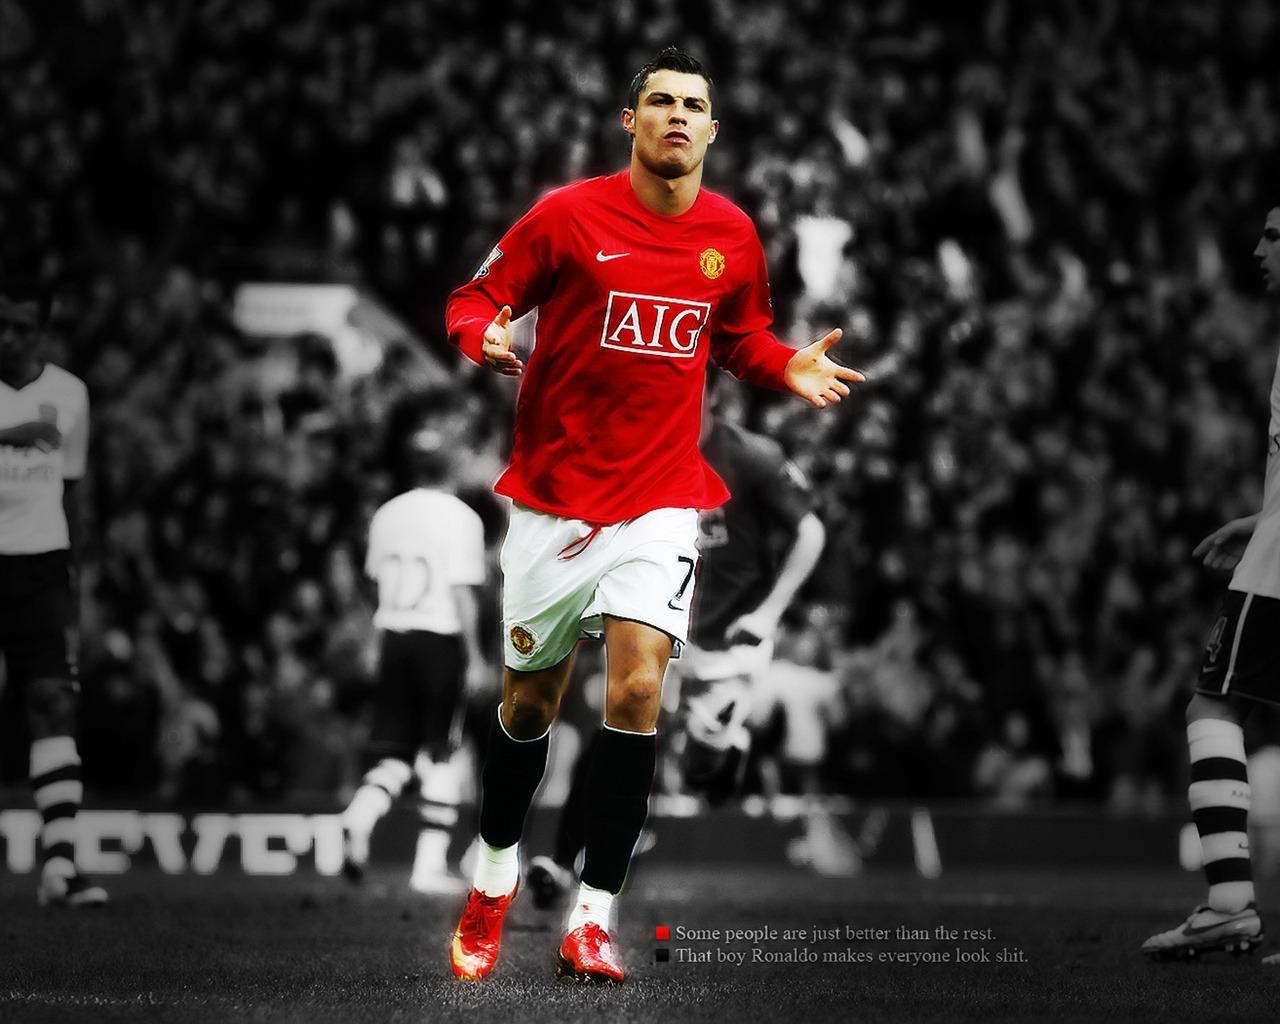 Football cristiano ronaldo wallpaper - Wallpaper cr7 ...